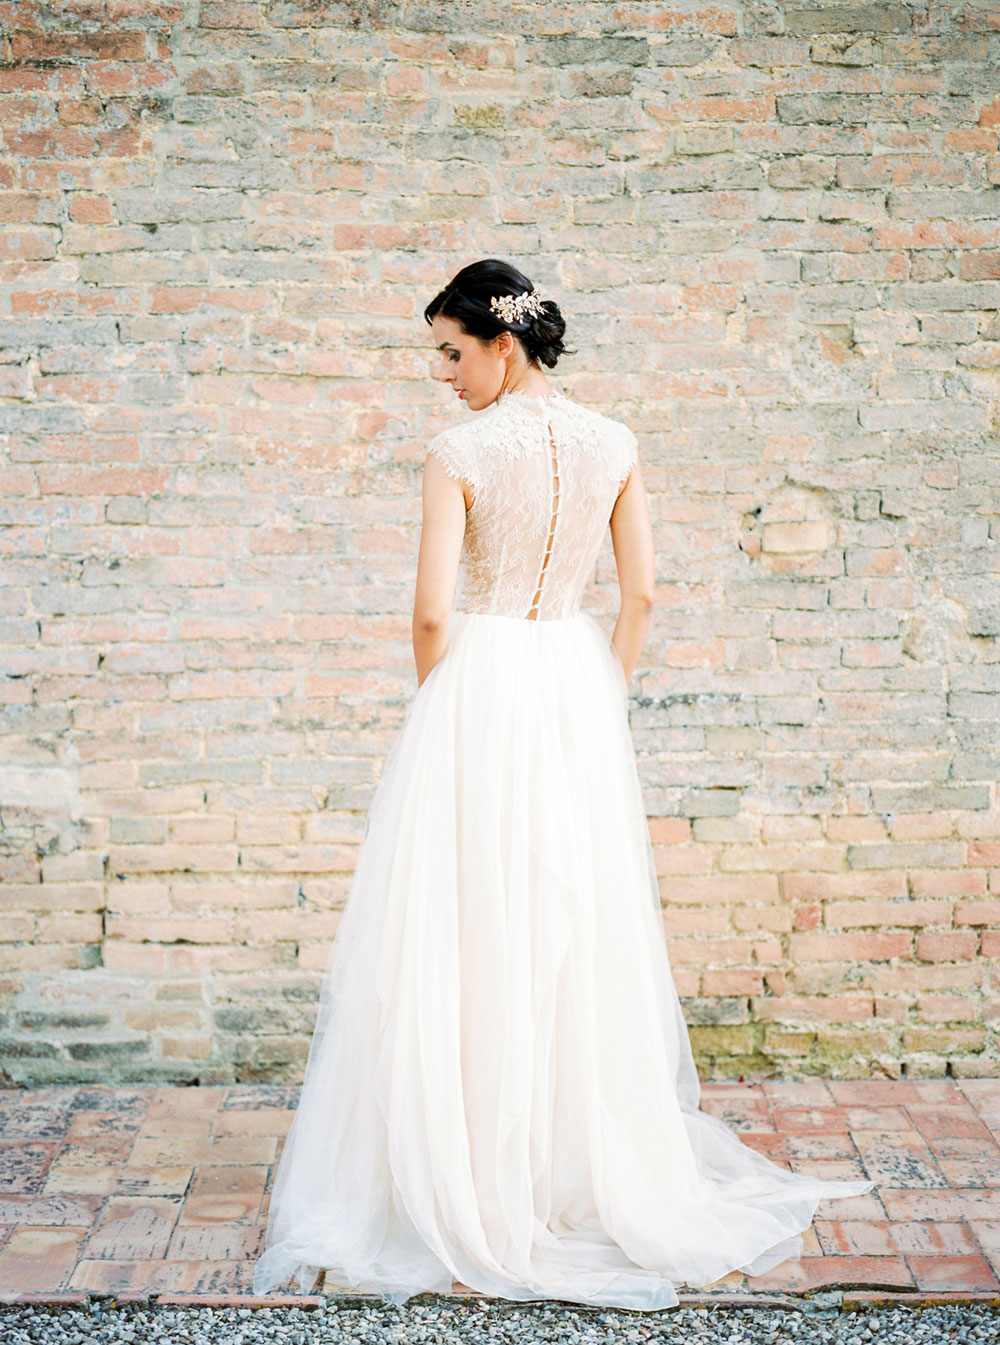 Linari-Tuscany-Elopement-Courtney-Michaela-85